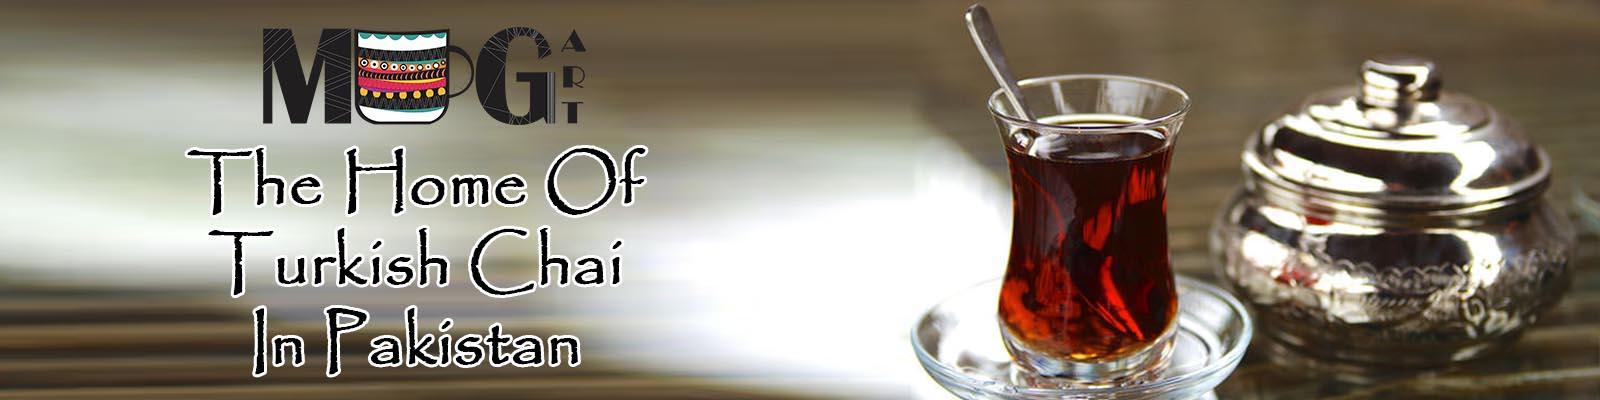 Turkish Tea & Cups